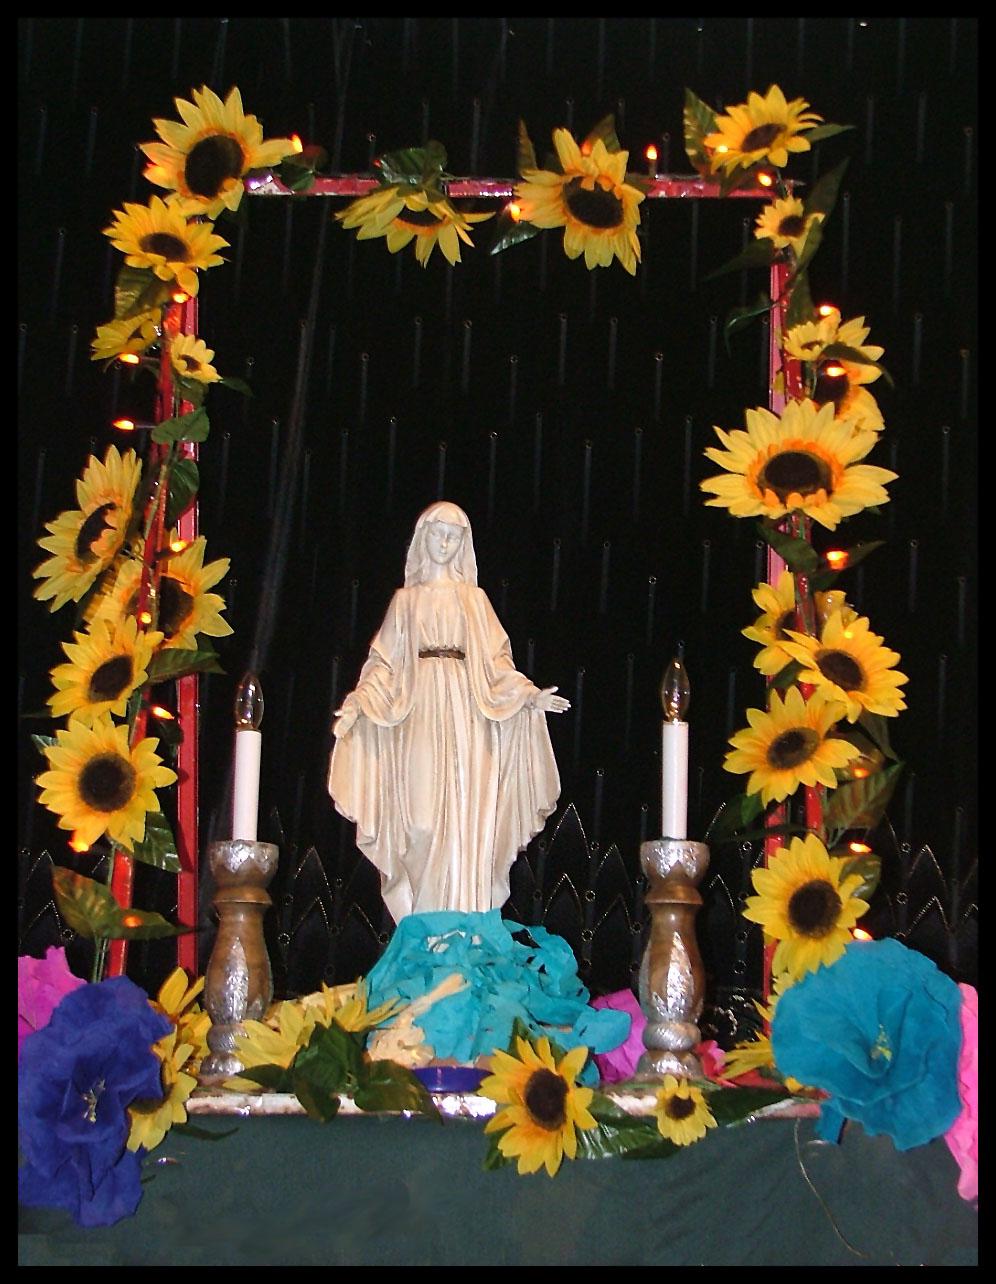 Part of an offering for dia de los muertos.